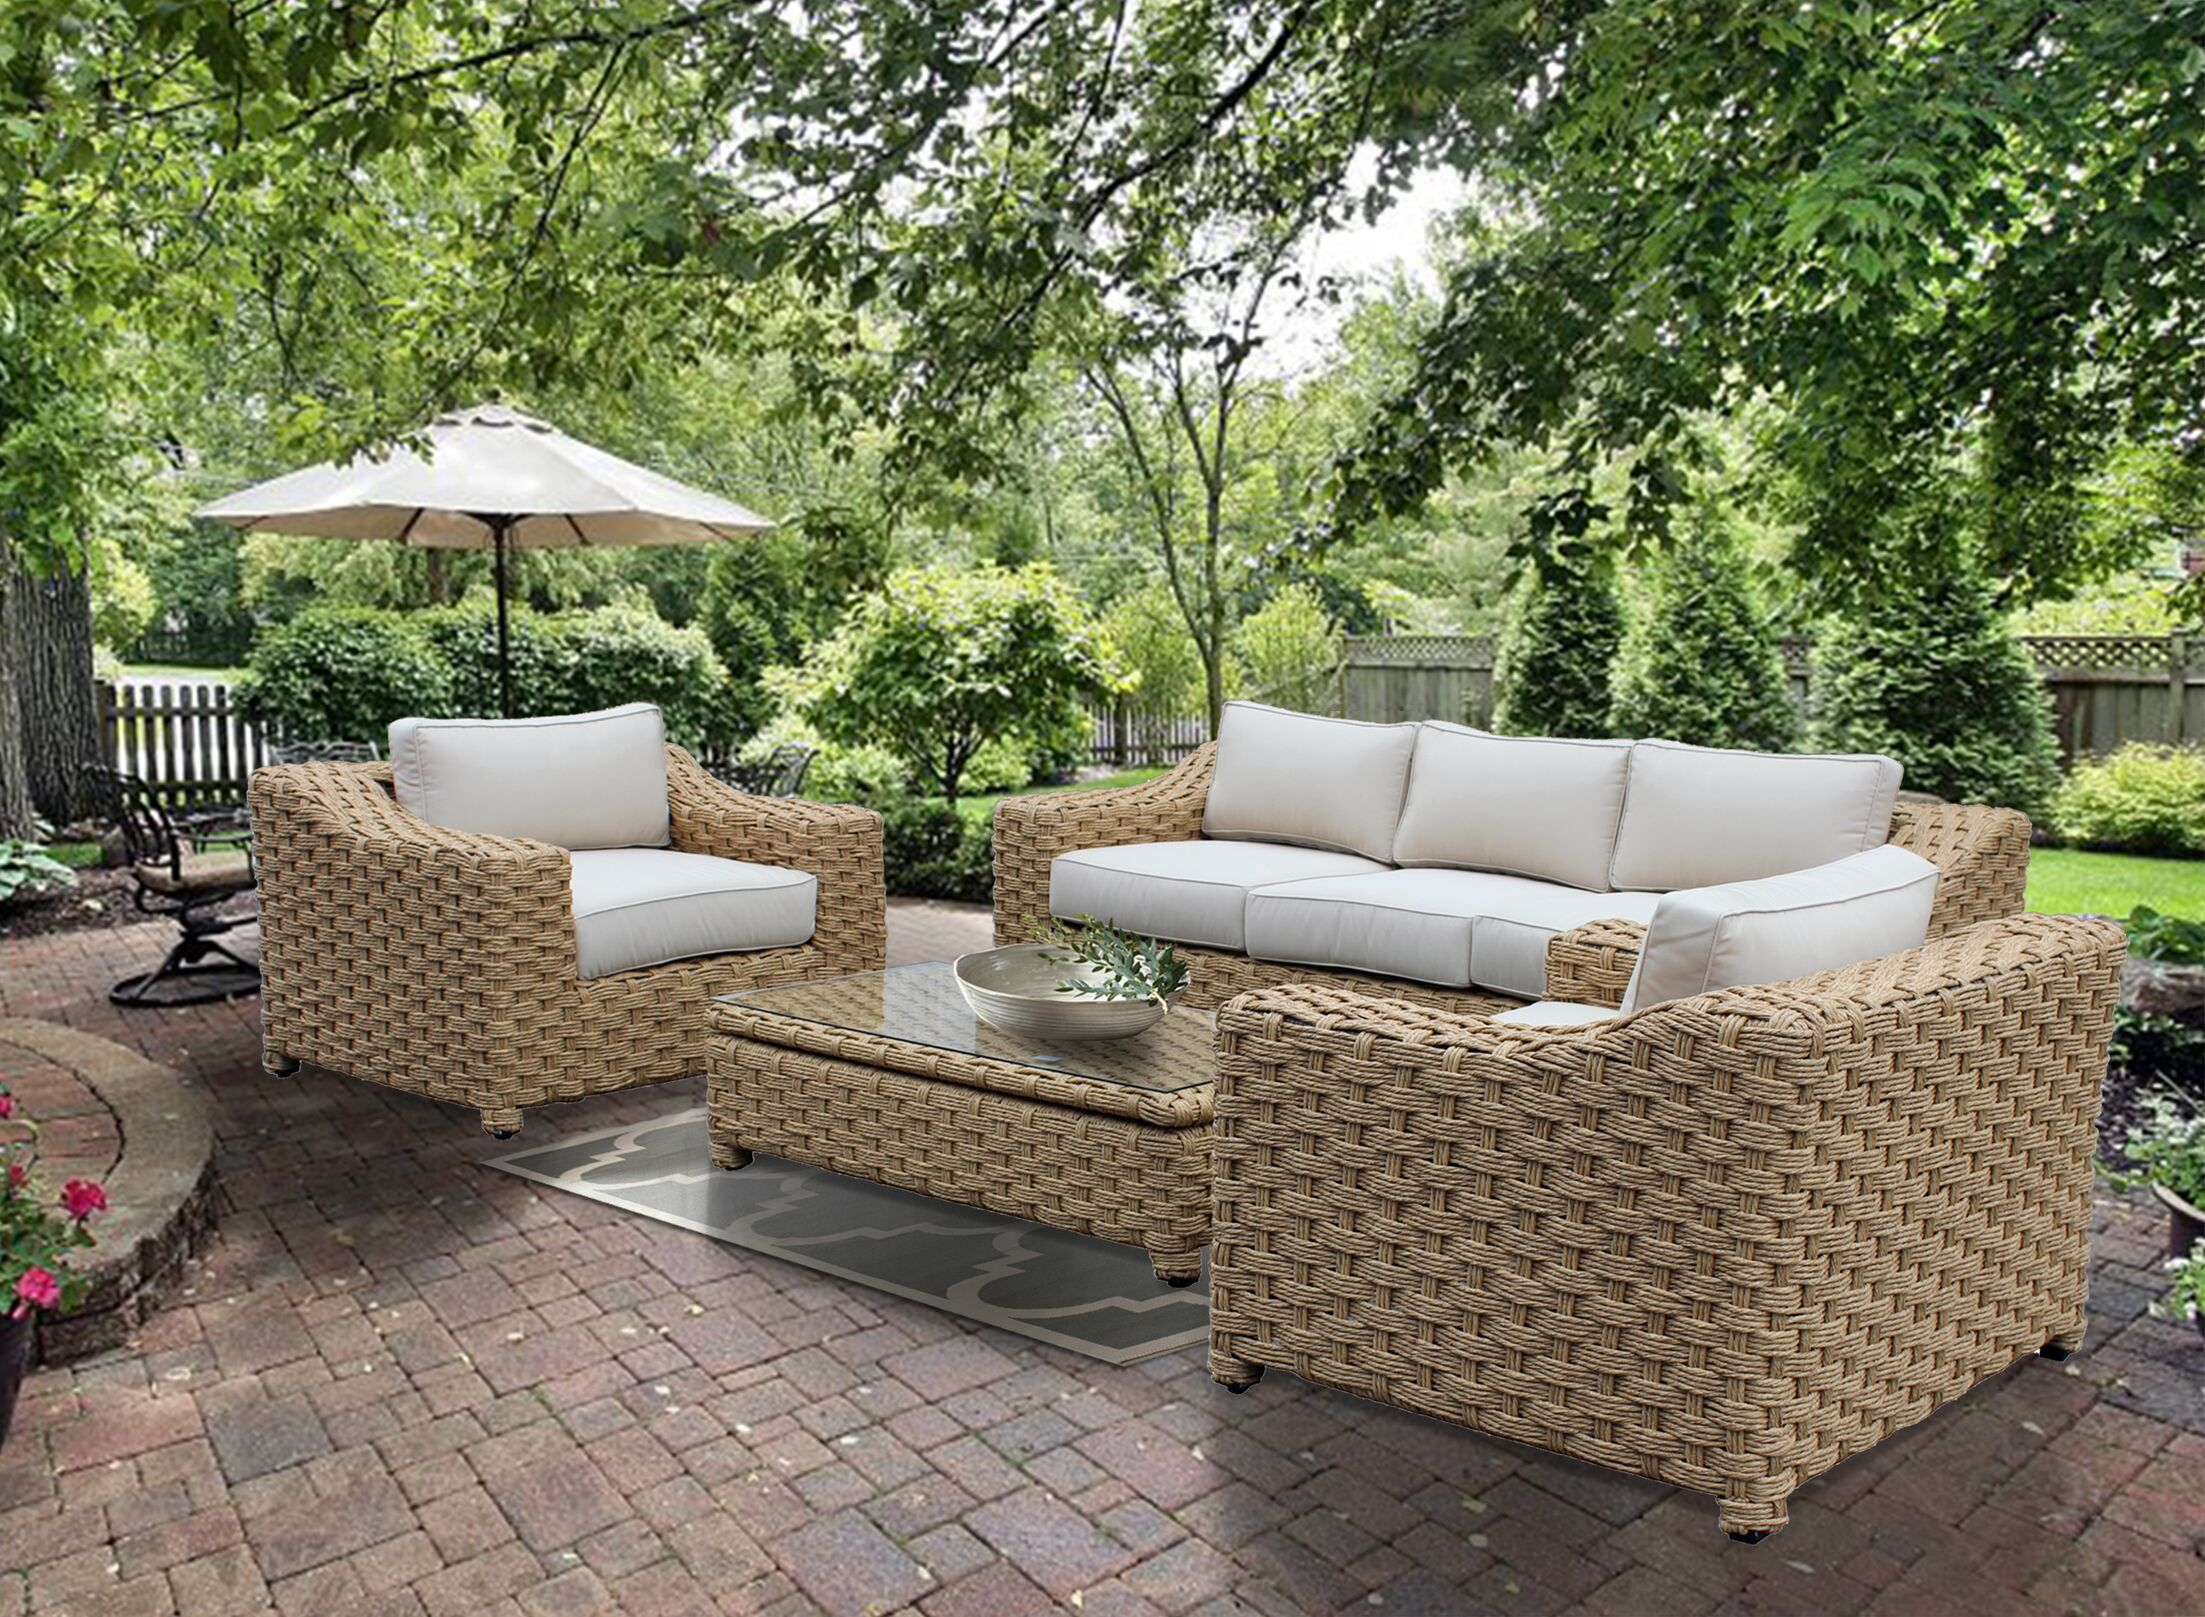 Dutil 4 Piece Rattan Sofa Set with Cushions